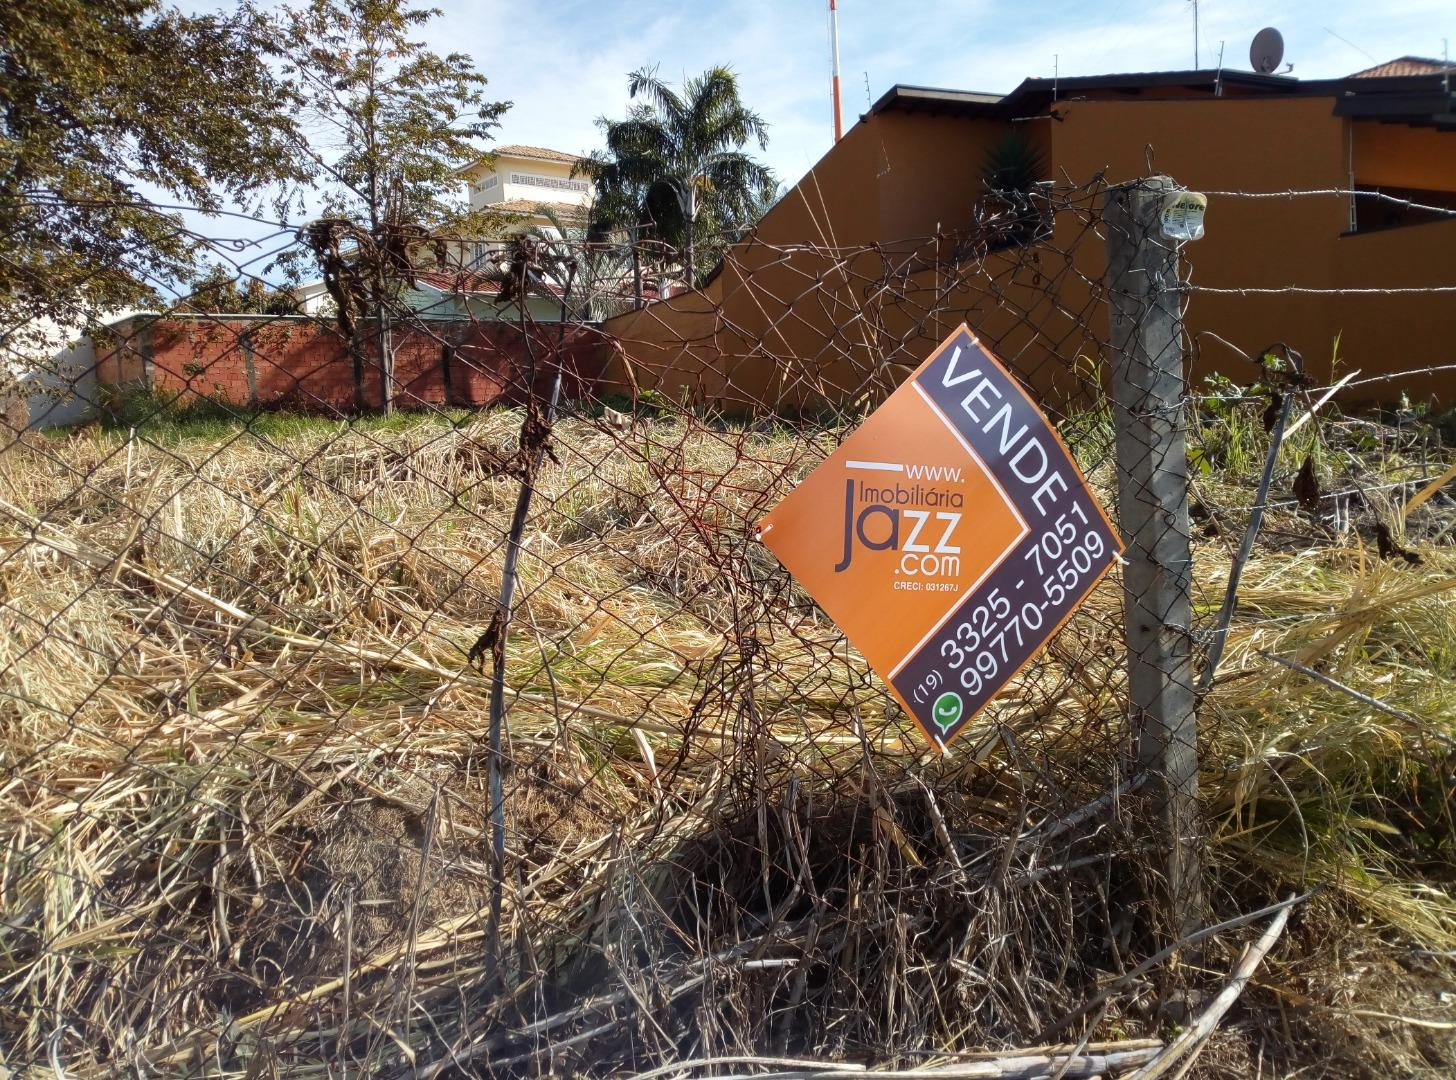 Terreno à venda, 250 m² por R$ 340.000,00 - Alto Taquaral - Campinas/SP